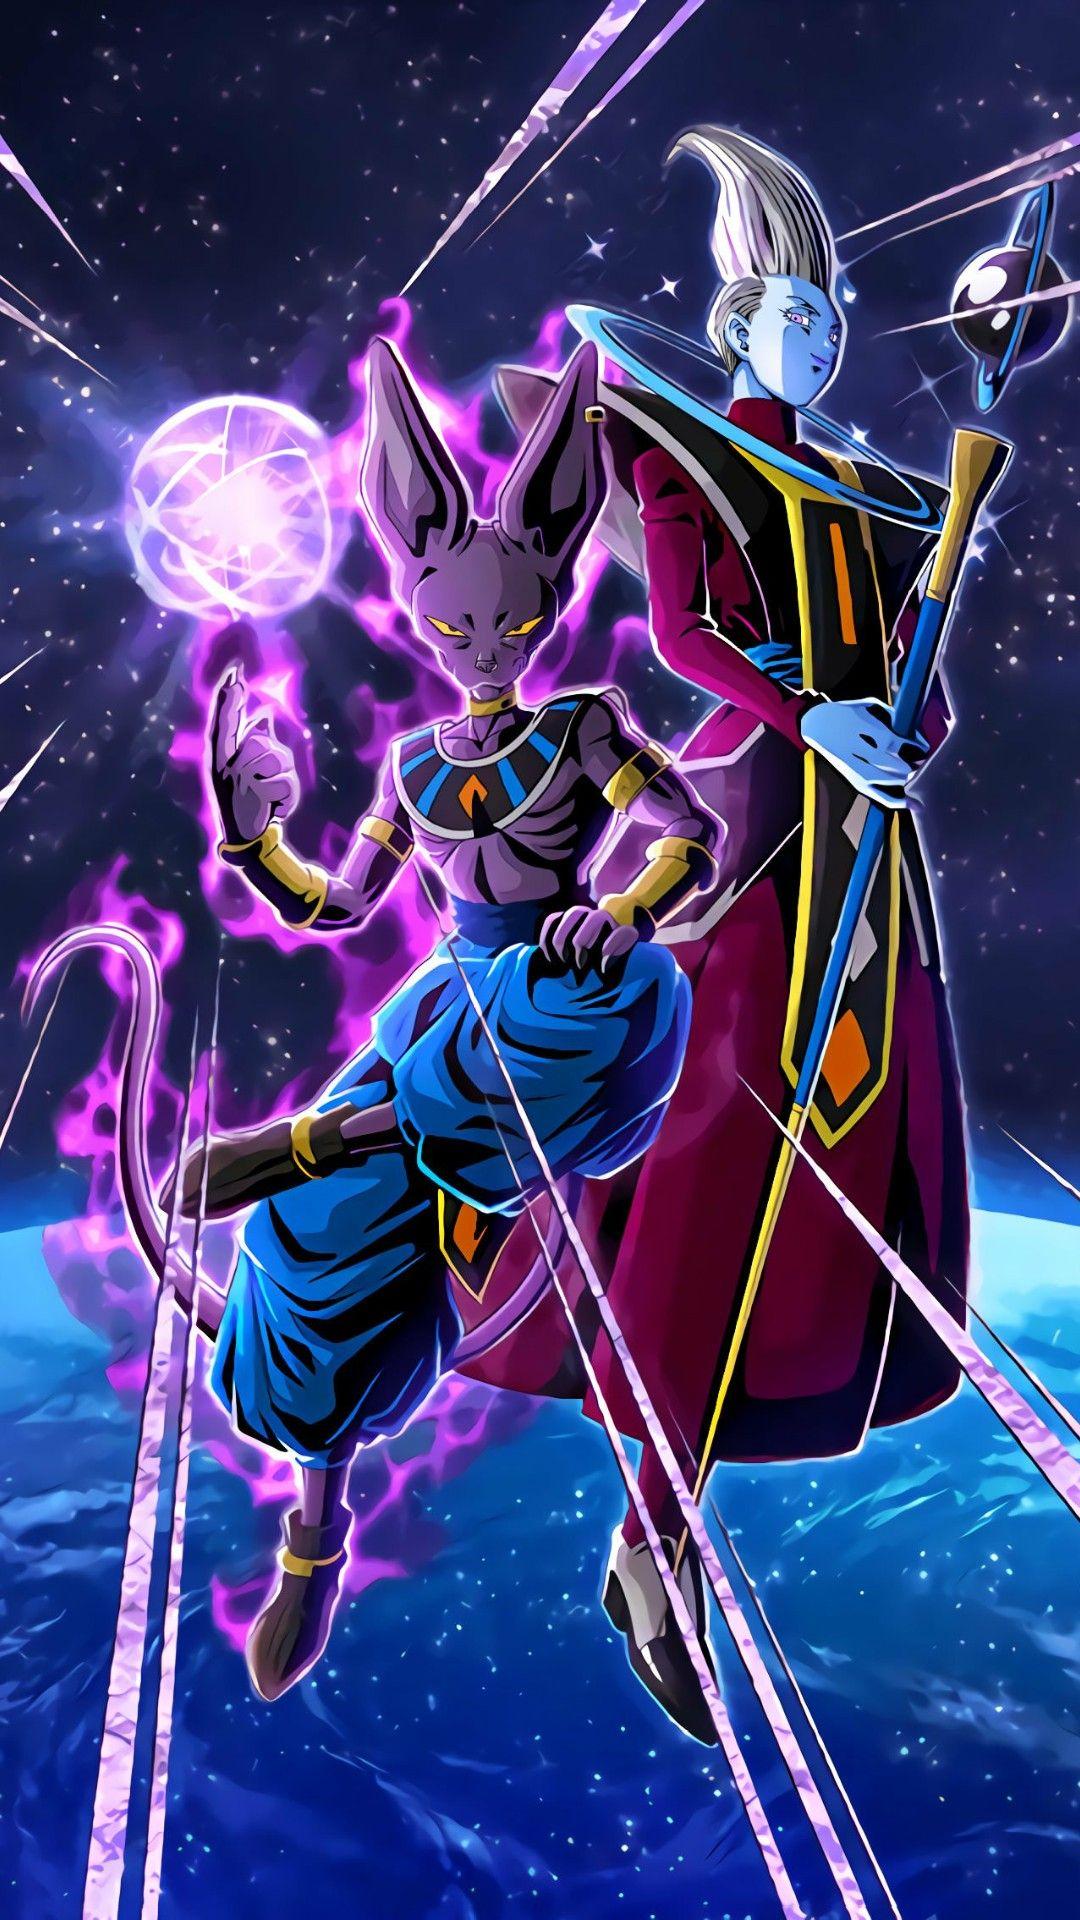 Bills Sama Y Wiss Dragon Ball Super Manga Anime Dragon Ball Super Dragon Ball